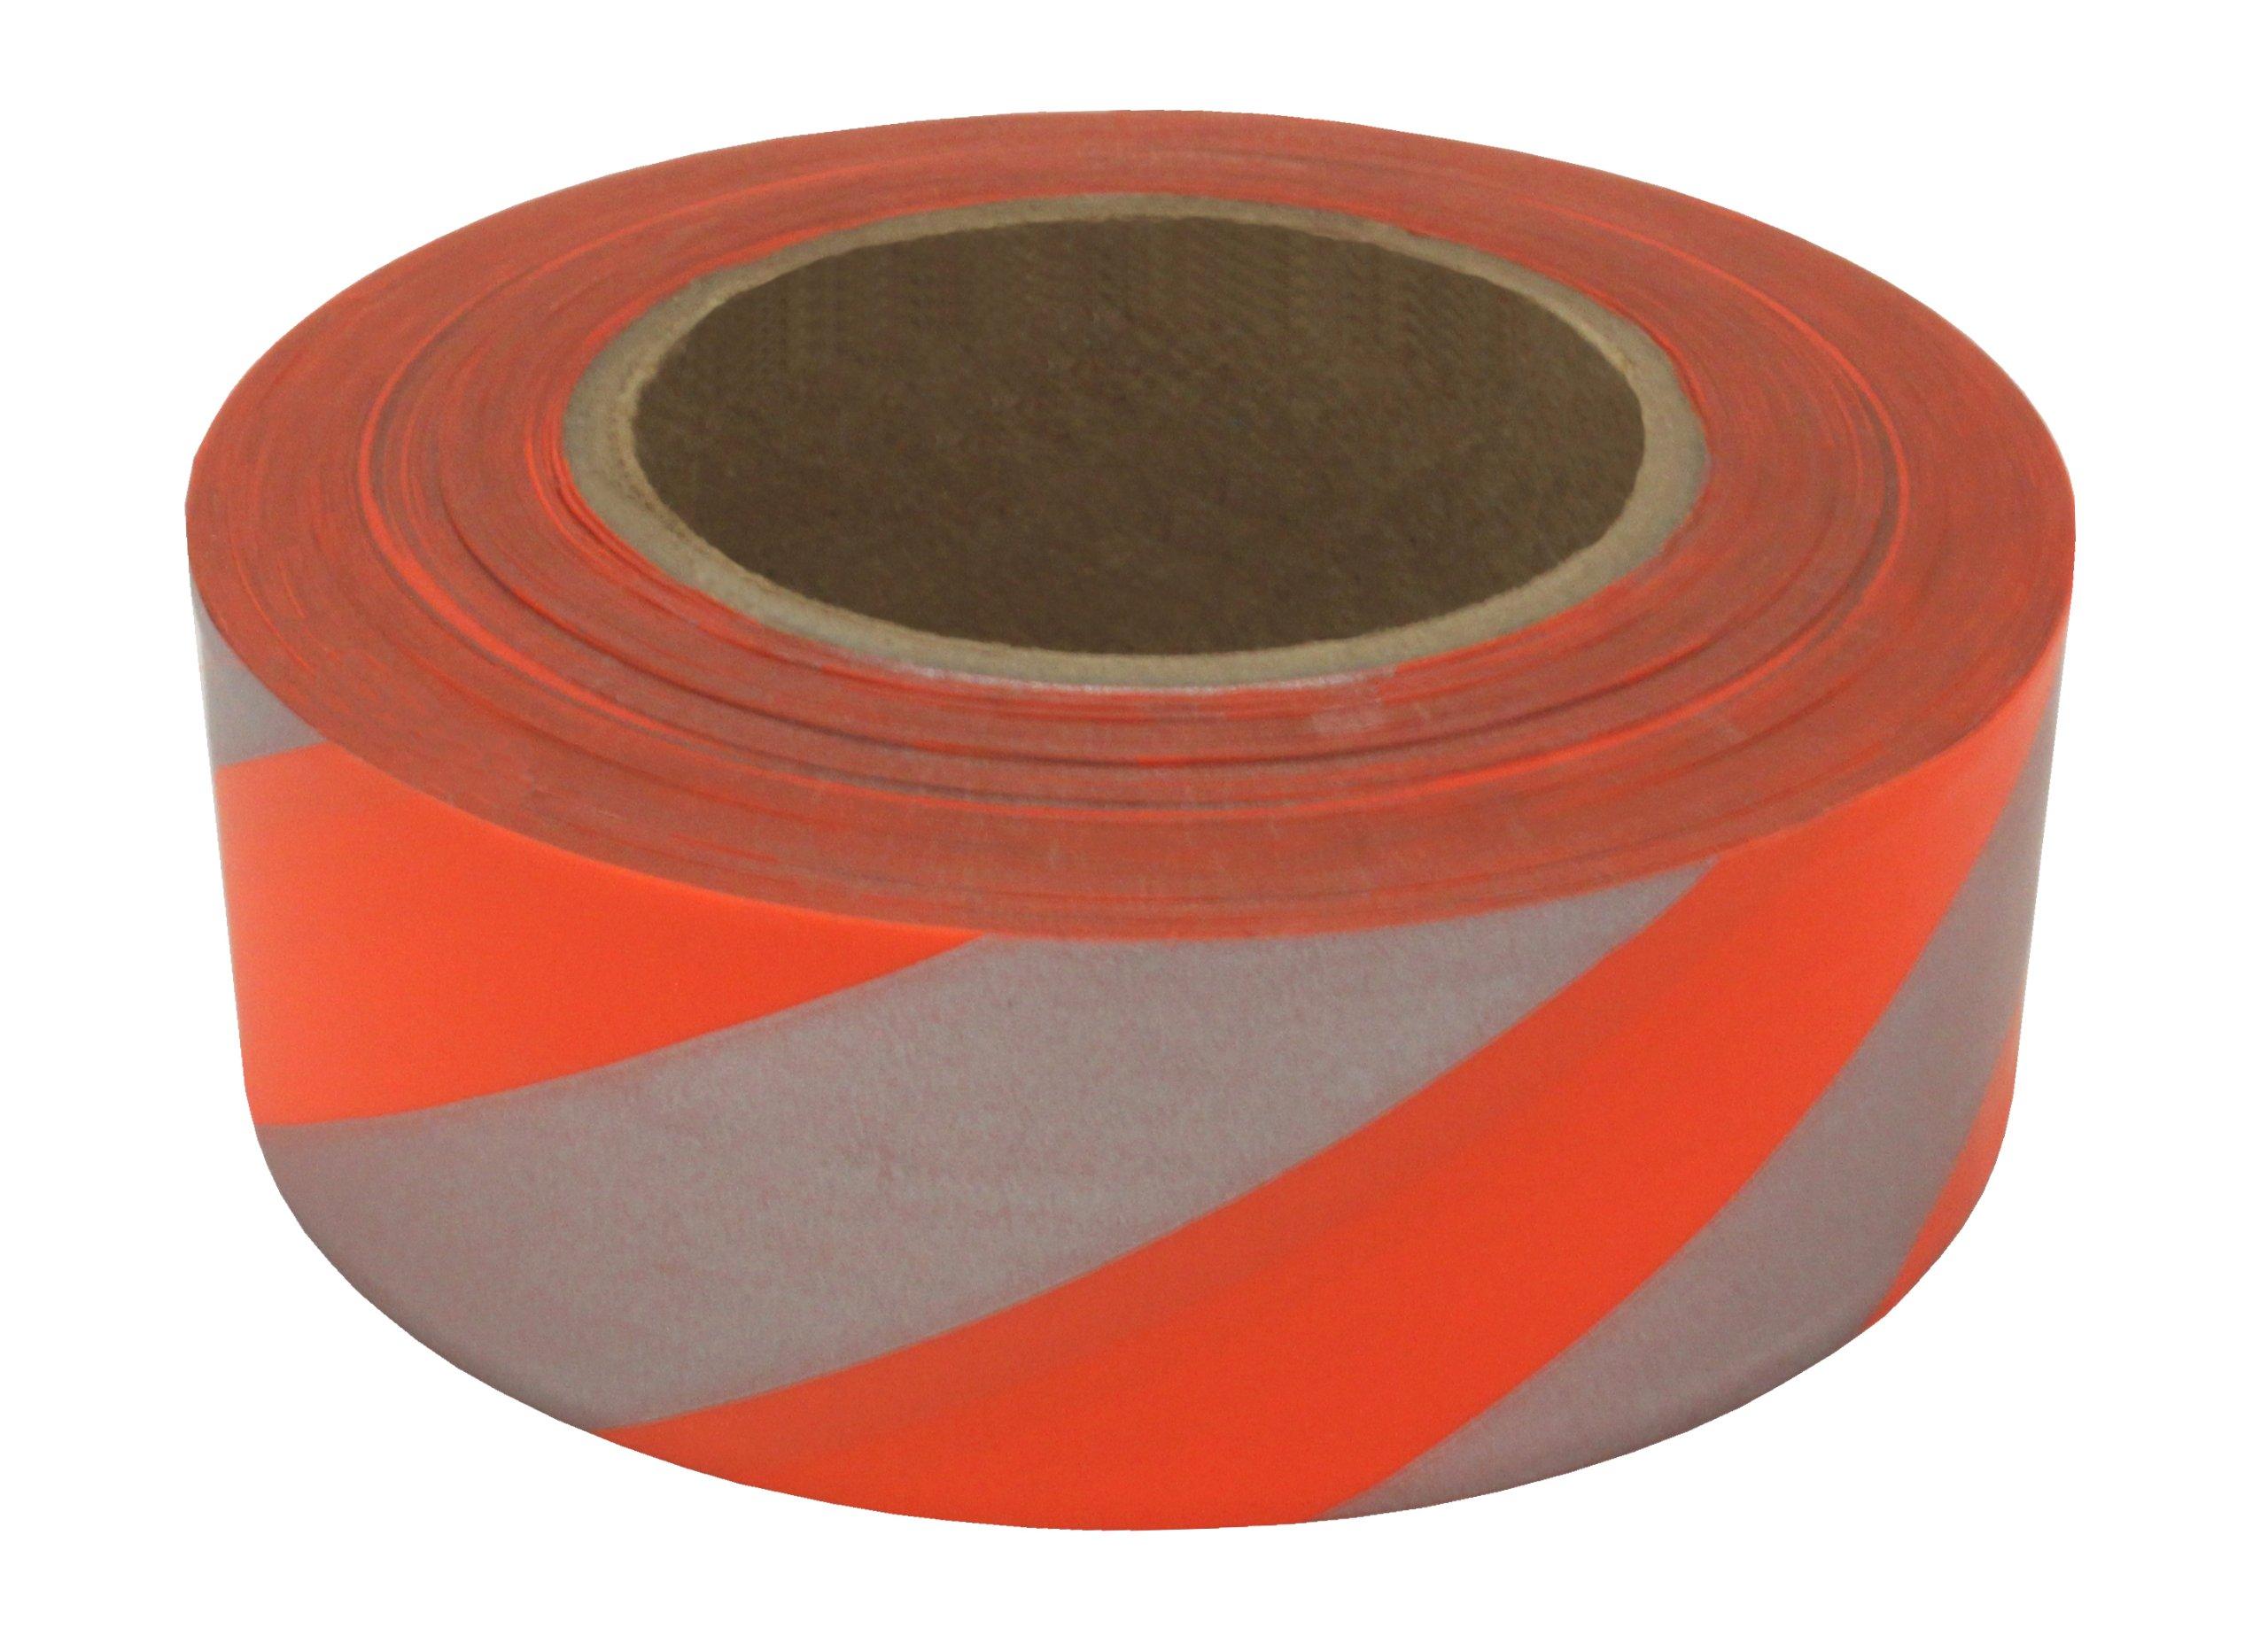 Presco SOGREF-658 150' Length x 1-3/16'' Width, PVC Film, Day/Night Orange Glo Striped Patterned Roll Flagging (Pack of 144)